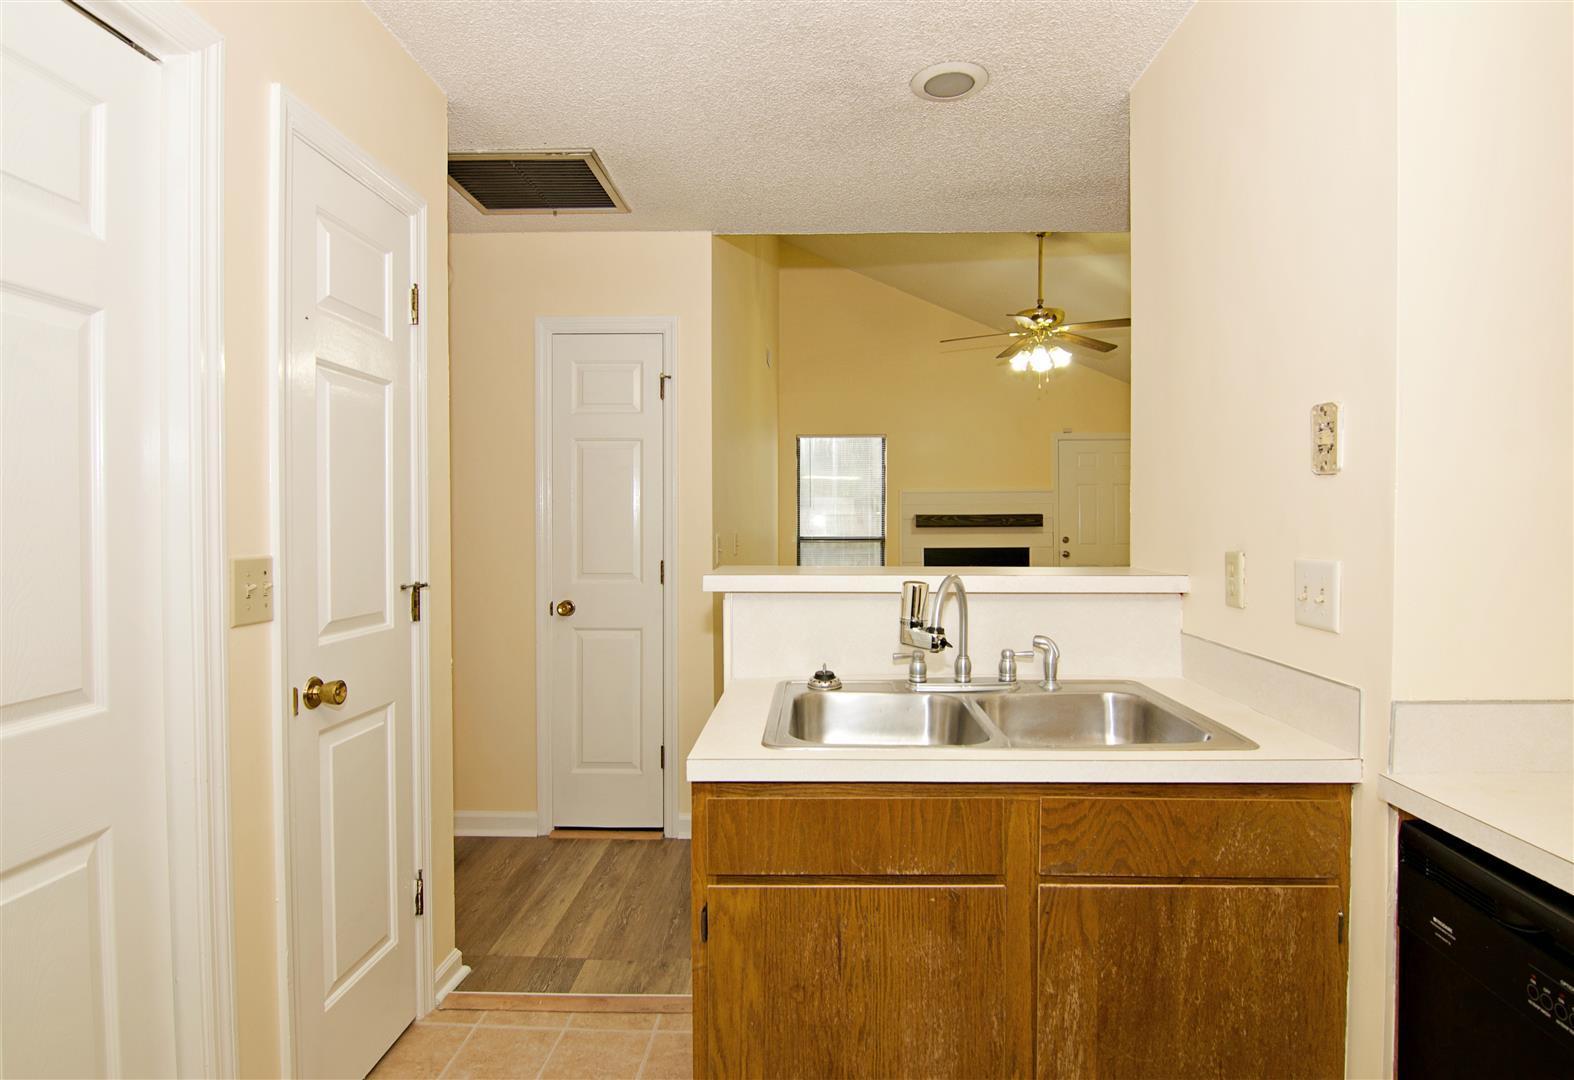 Shaftesbury Woods Homes For Sale - 931 Estates, Charleston, SC - 13